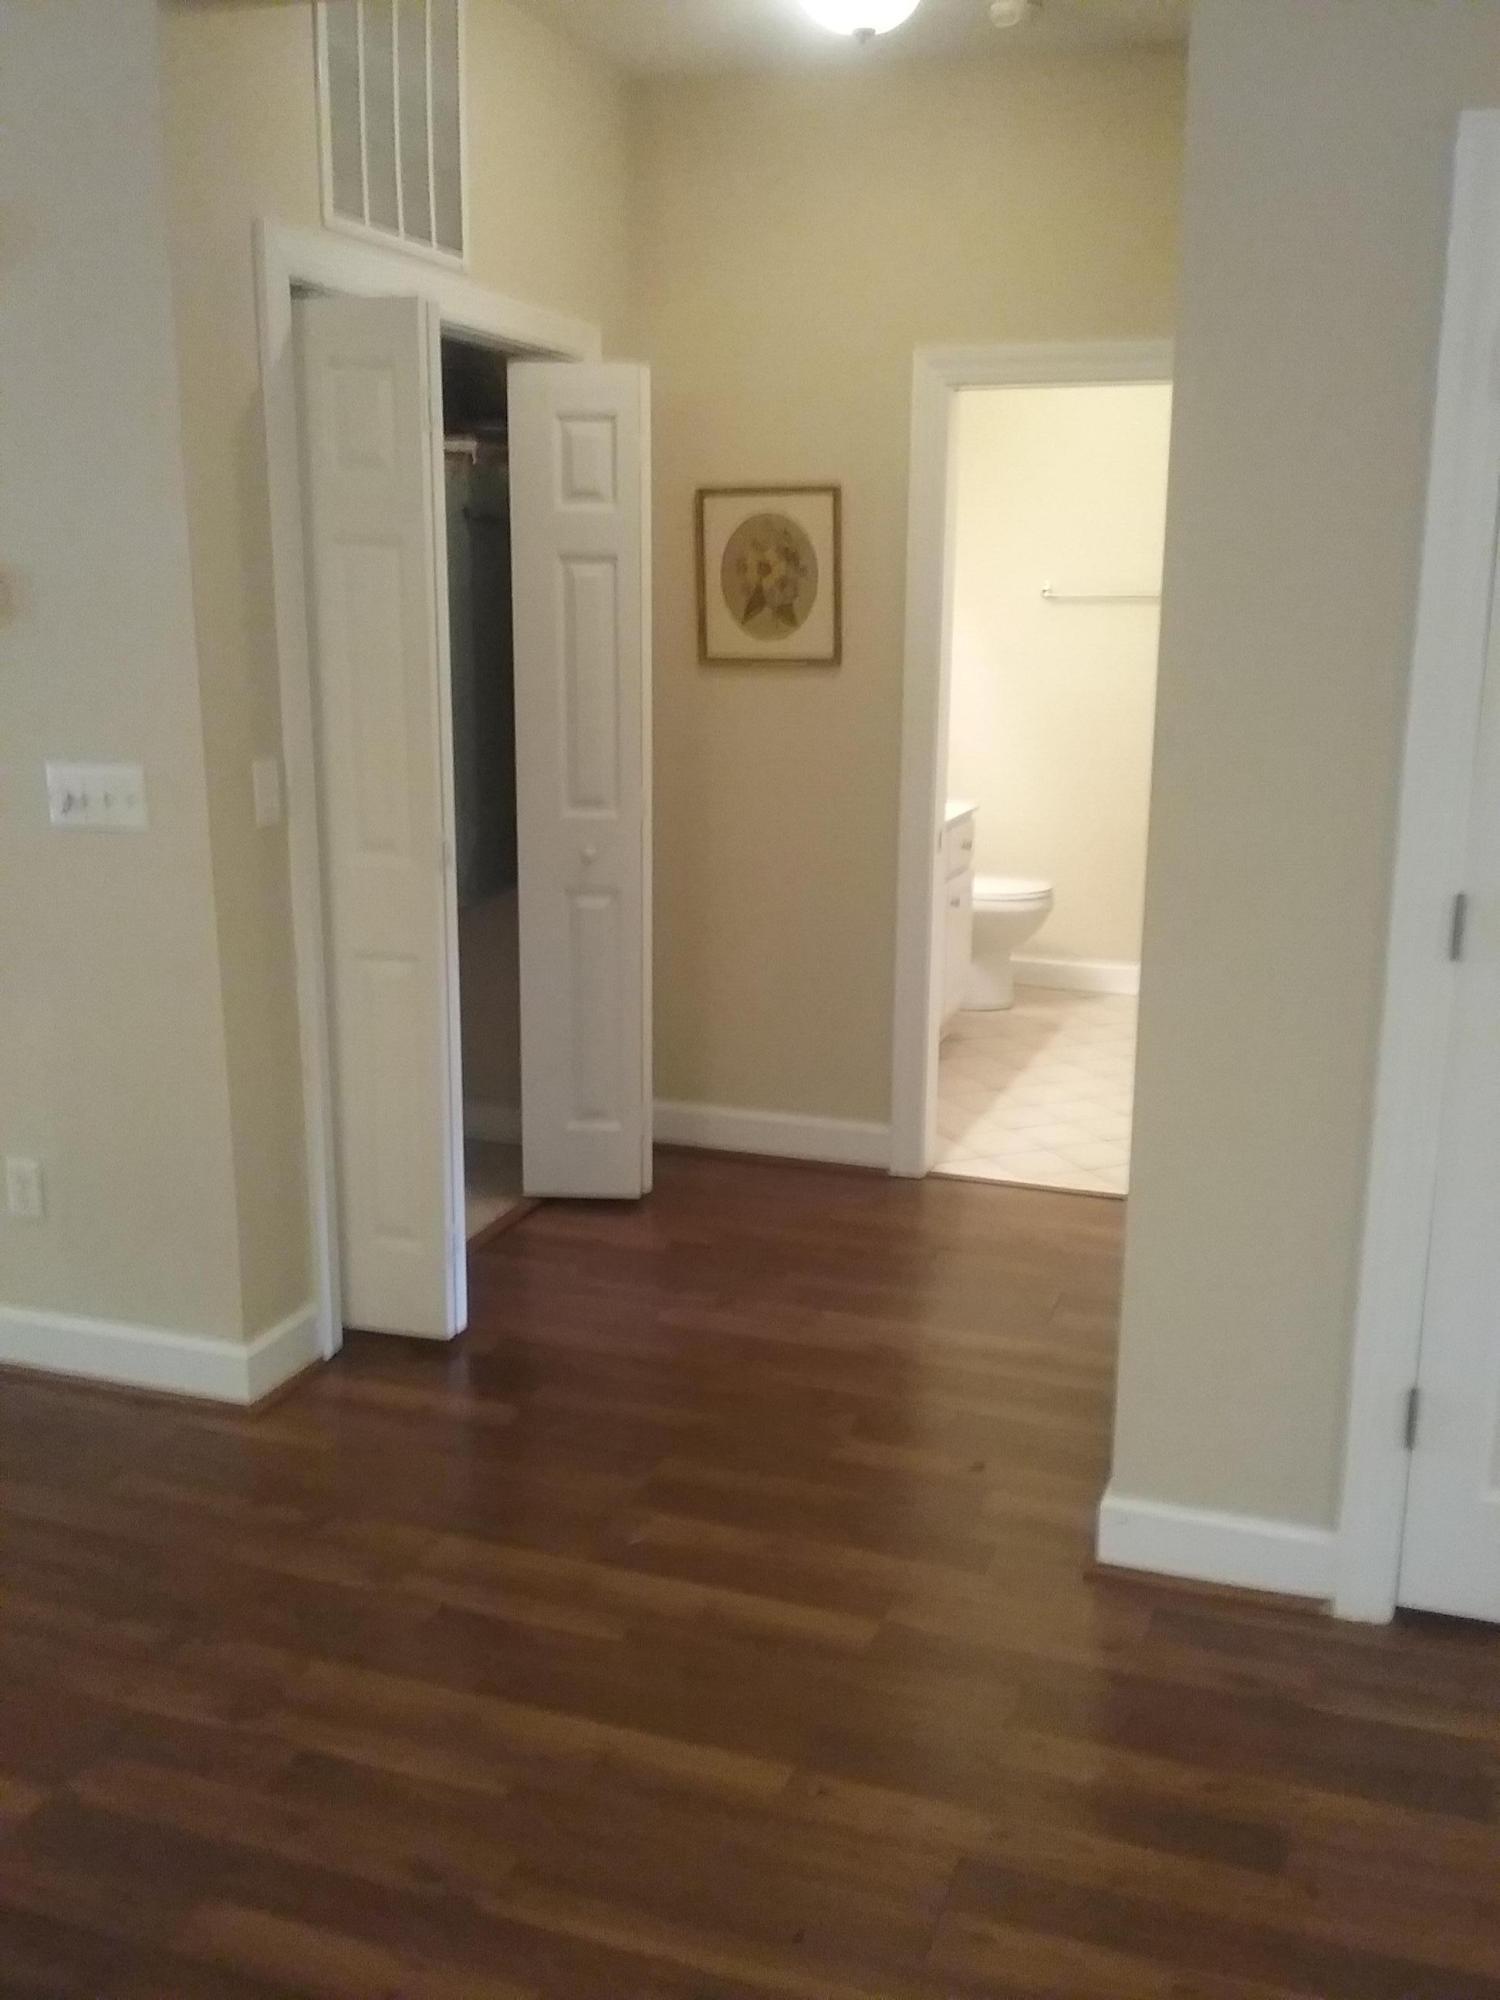 Ballards Pointe II Homes For Sale - 103 Ballard, Santee, SC - 25